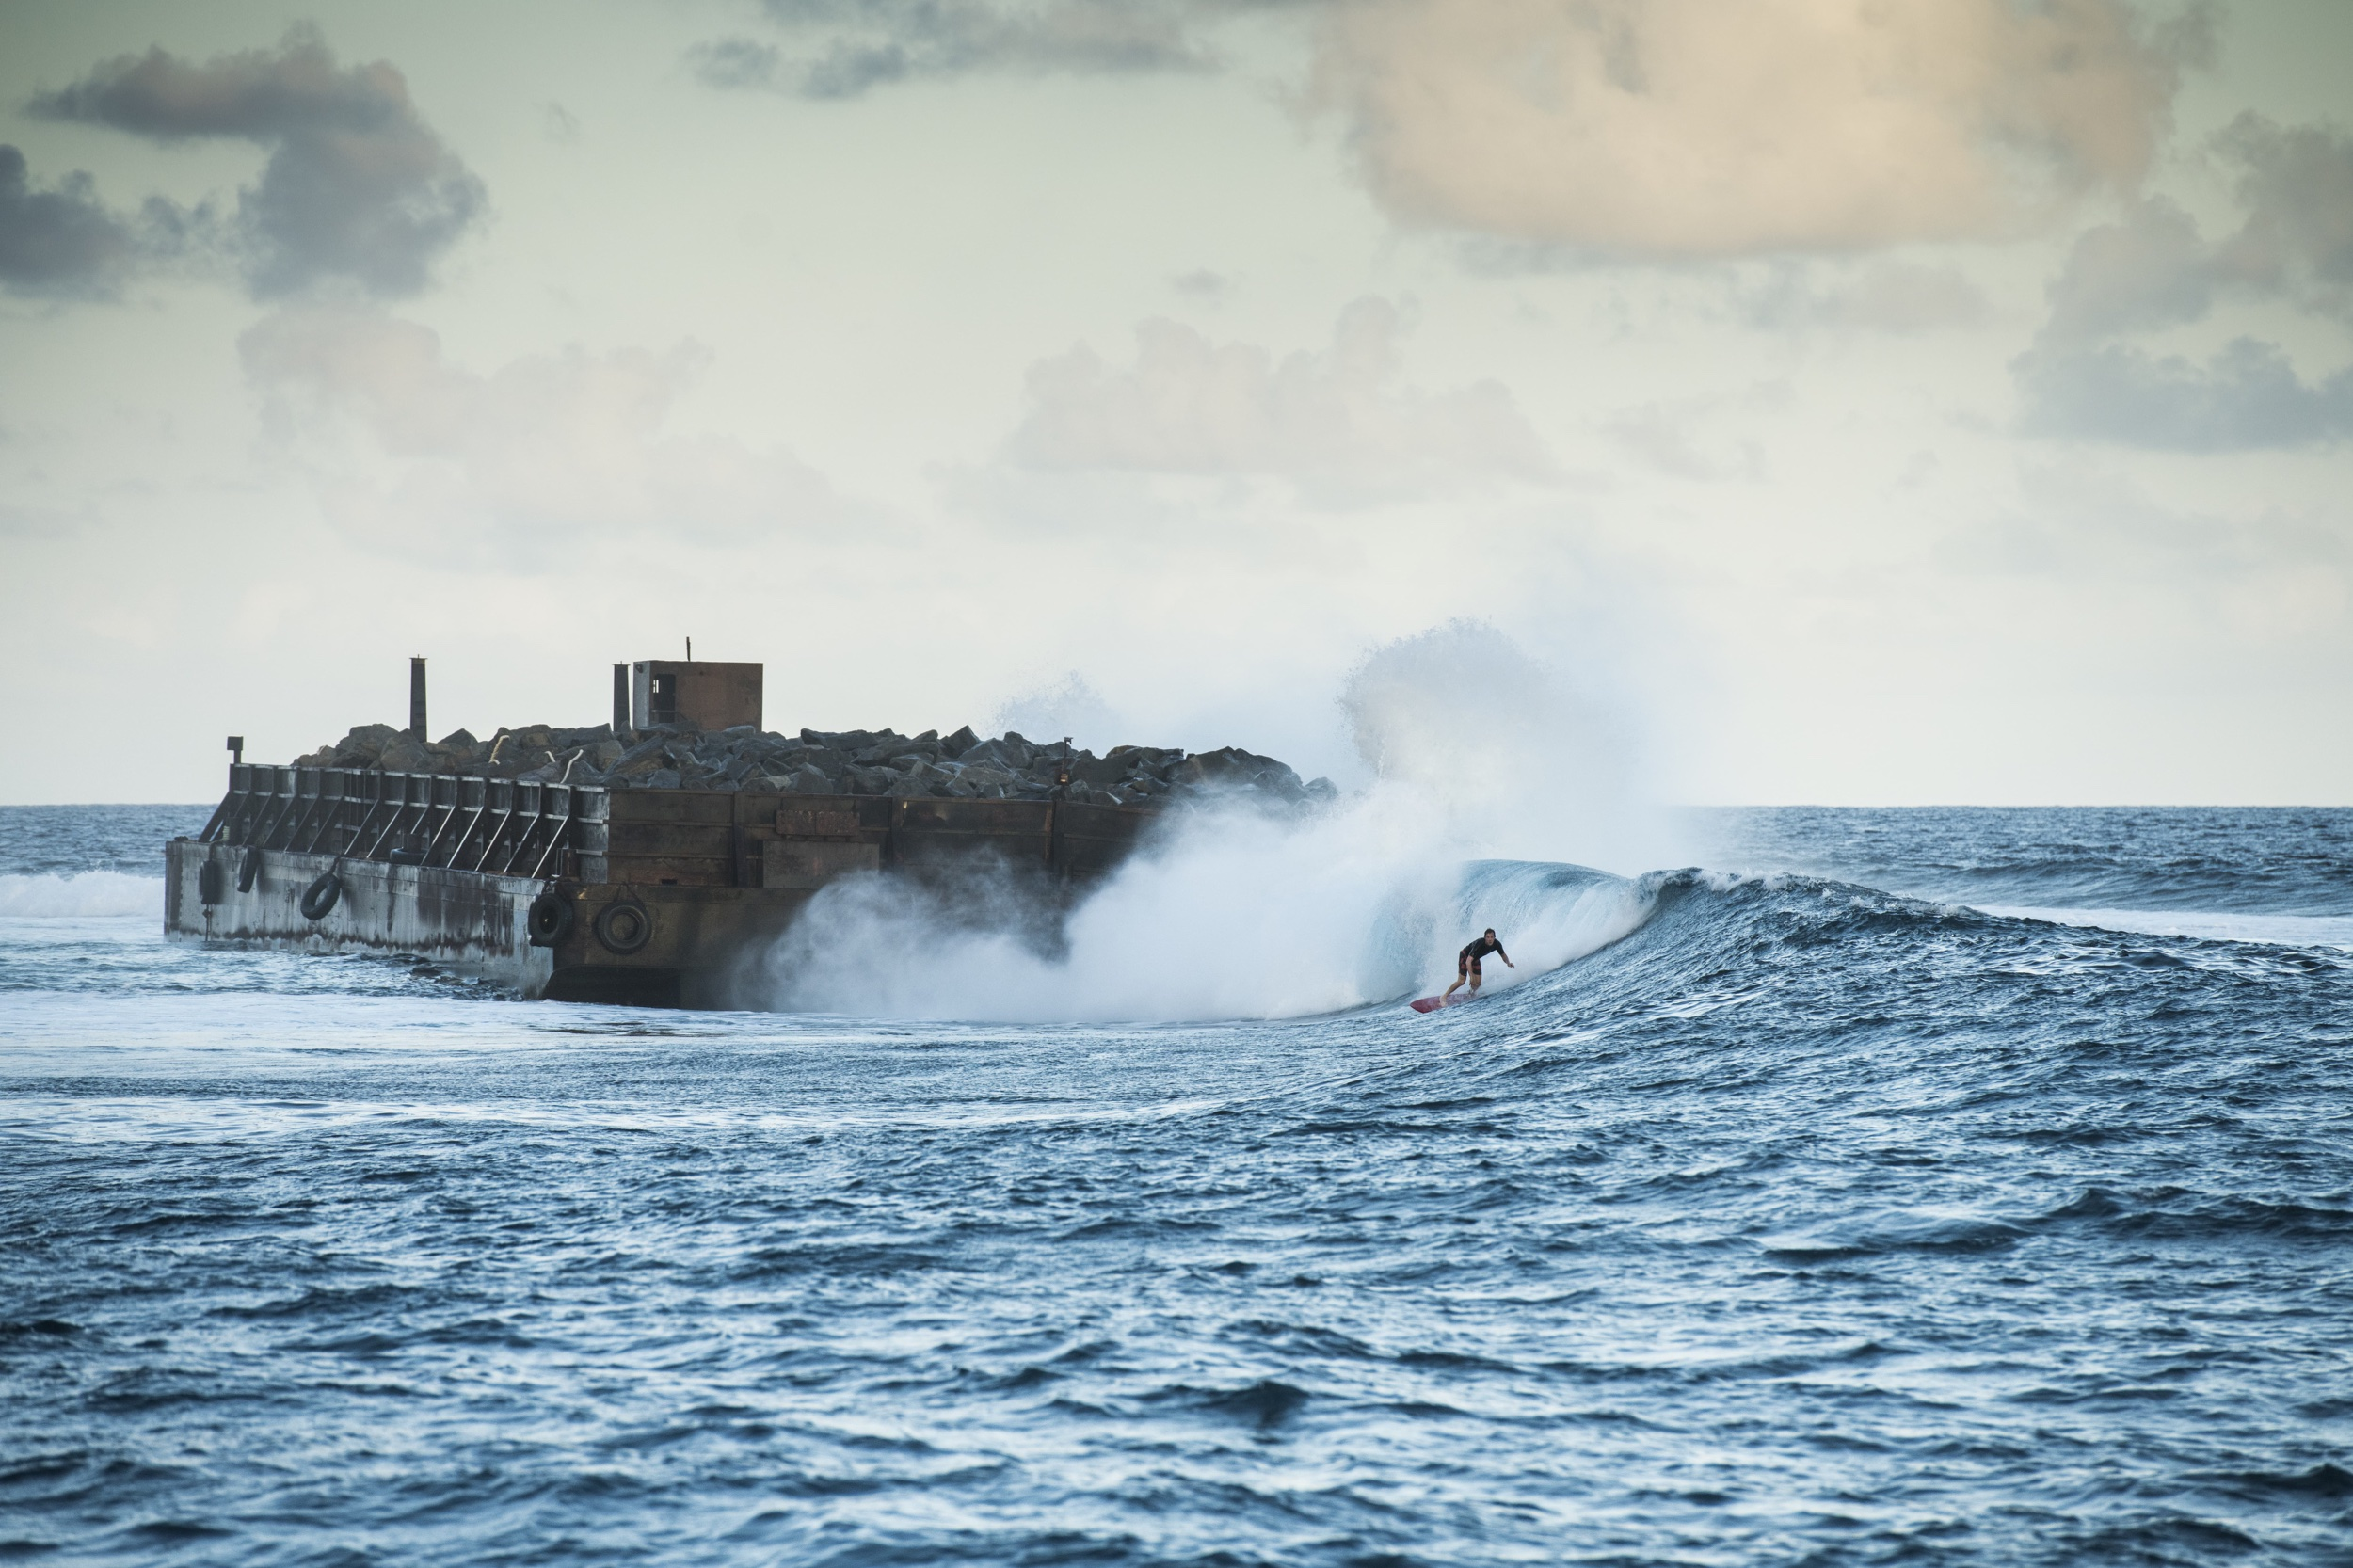 afp_4433_quirin shipwrek.jpeg